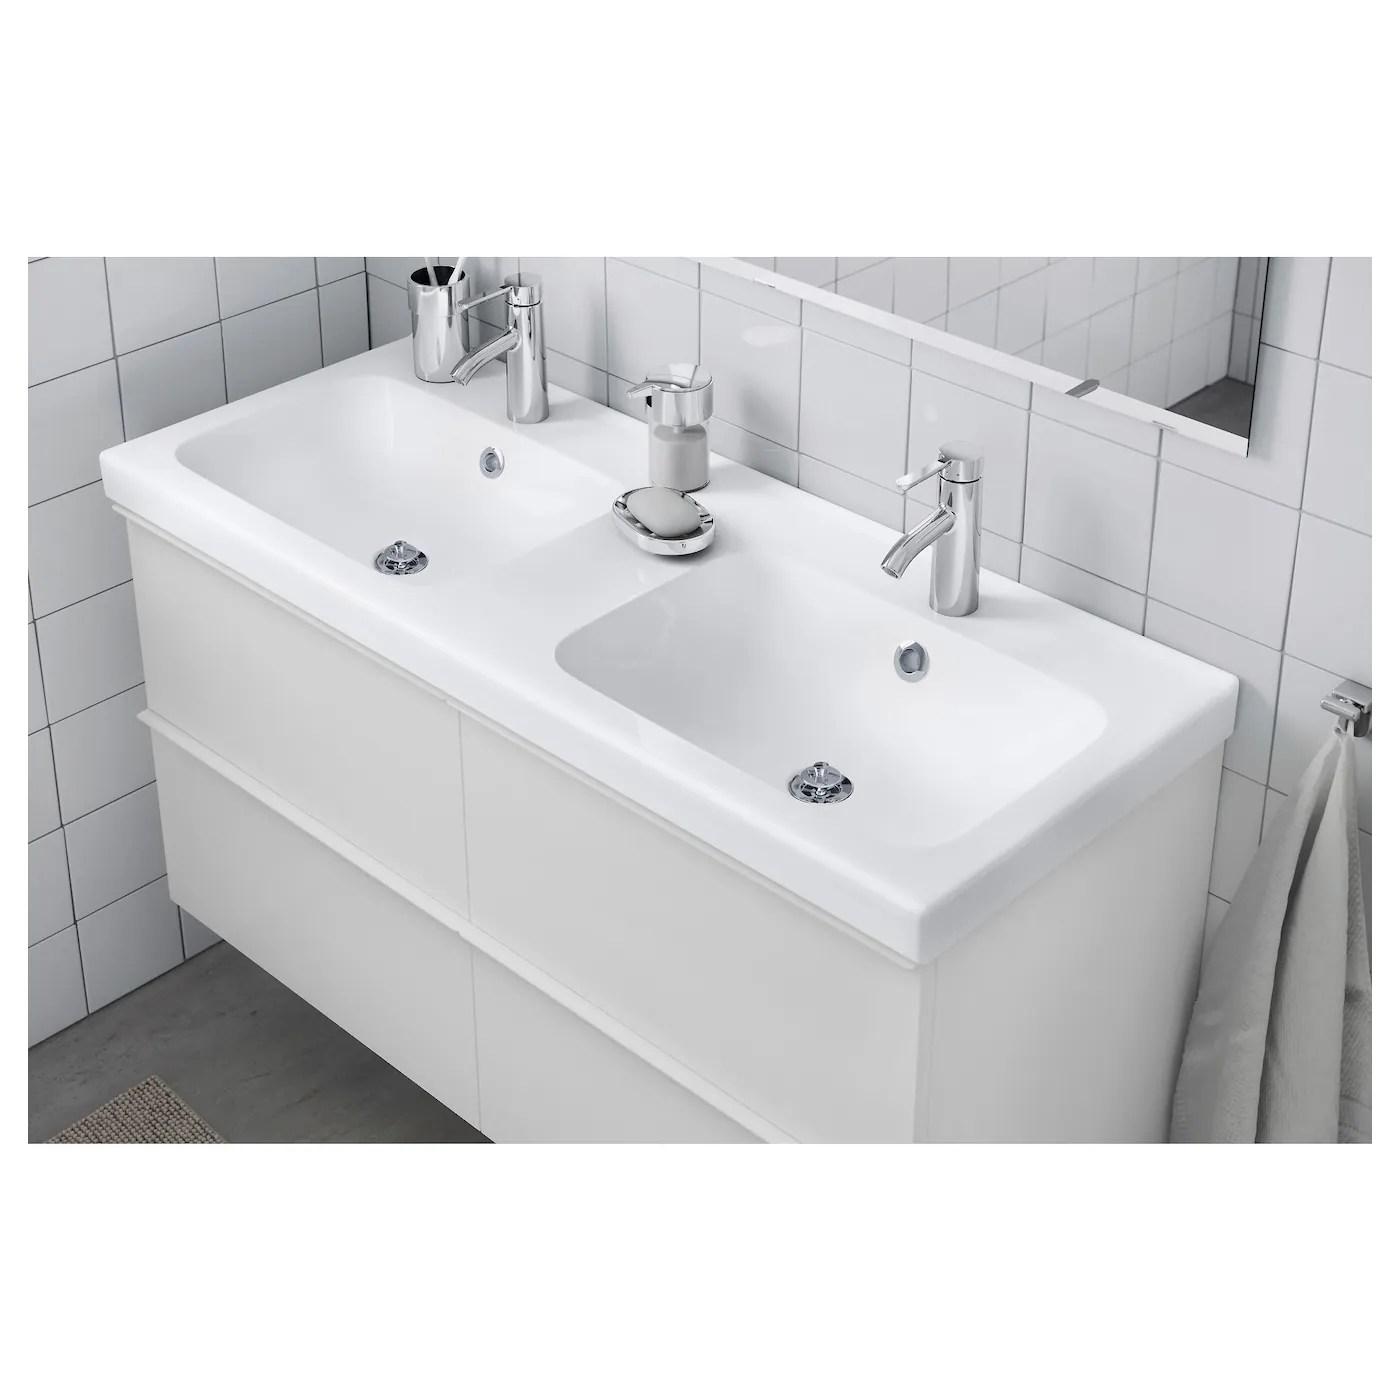 Odensvik Double Wash Basin 123 X 49 X 6 Cm Ikea